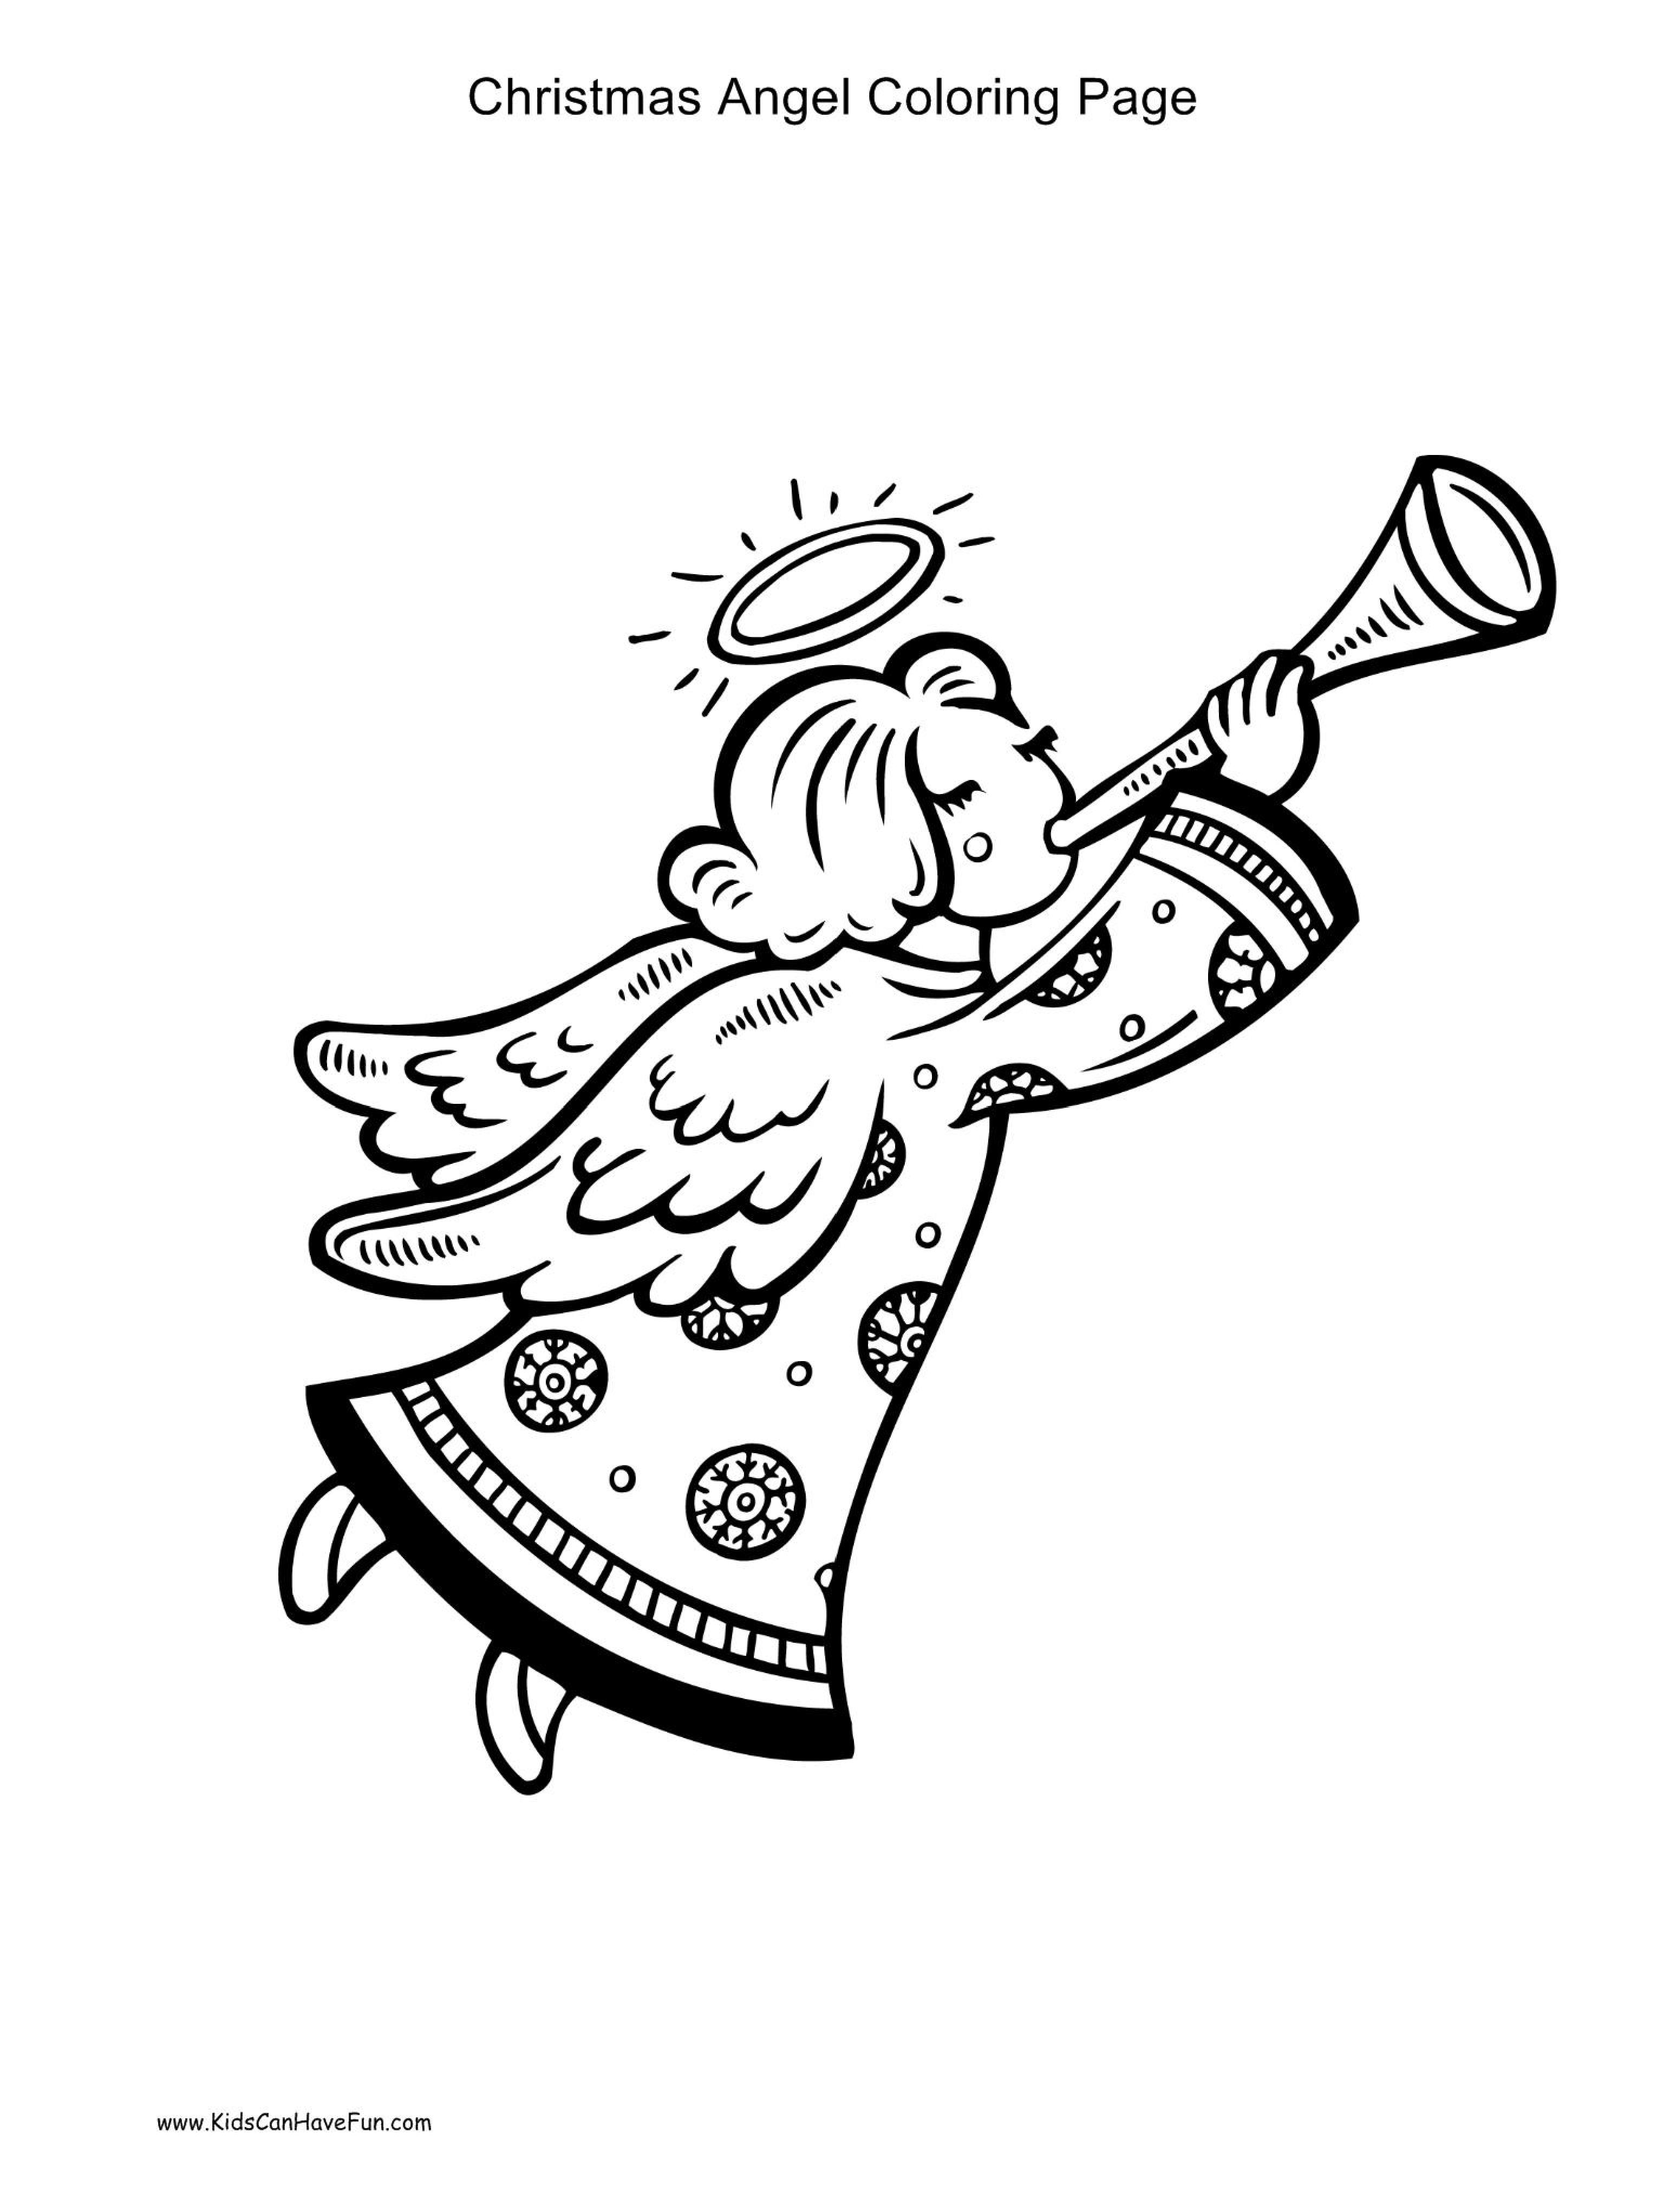 Christmas Angel Blowing Horn Coloring Page Kidscanhavefun Coloringhtm